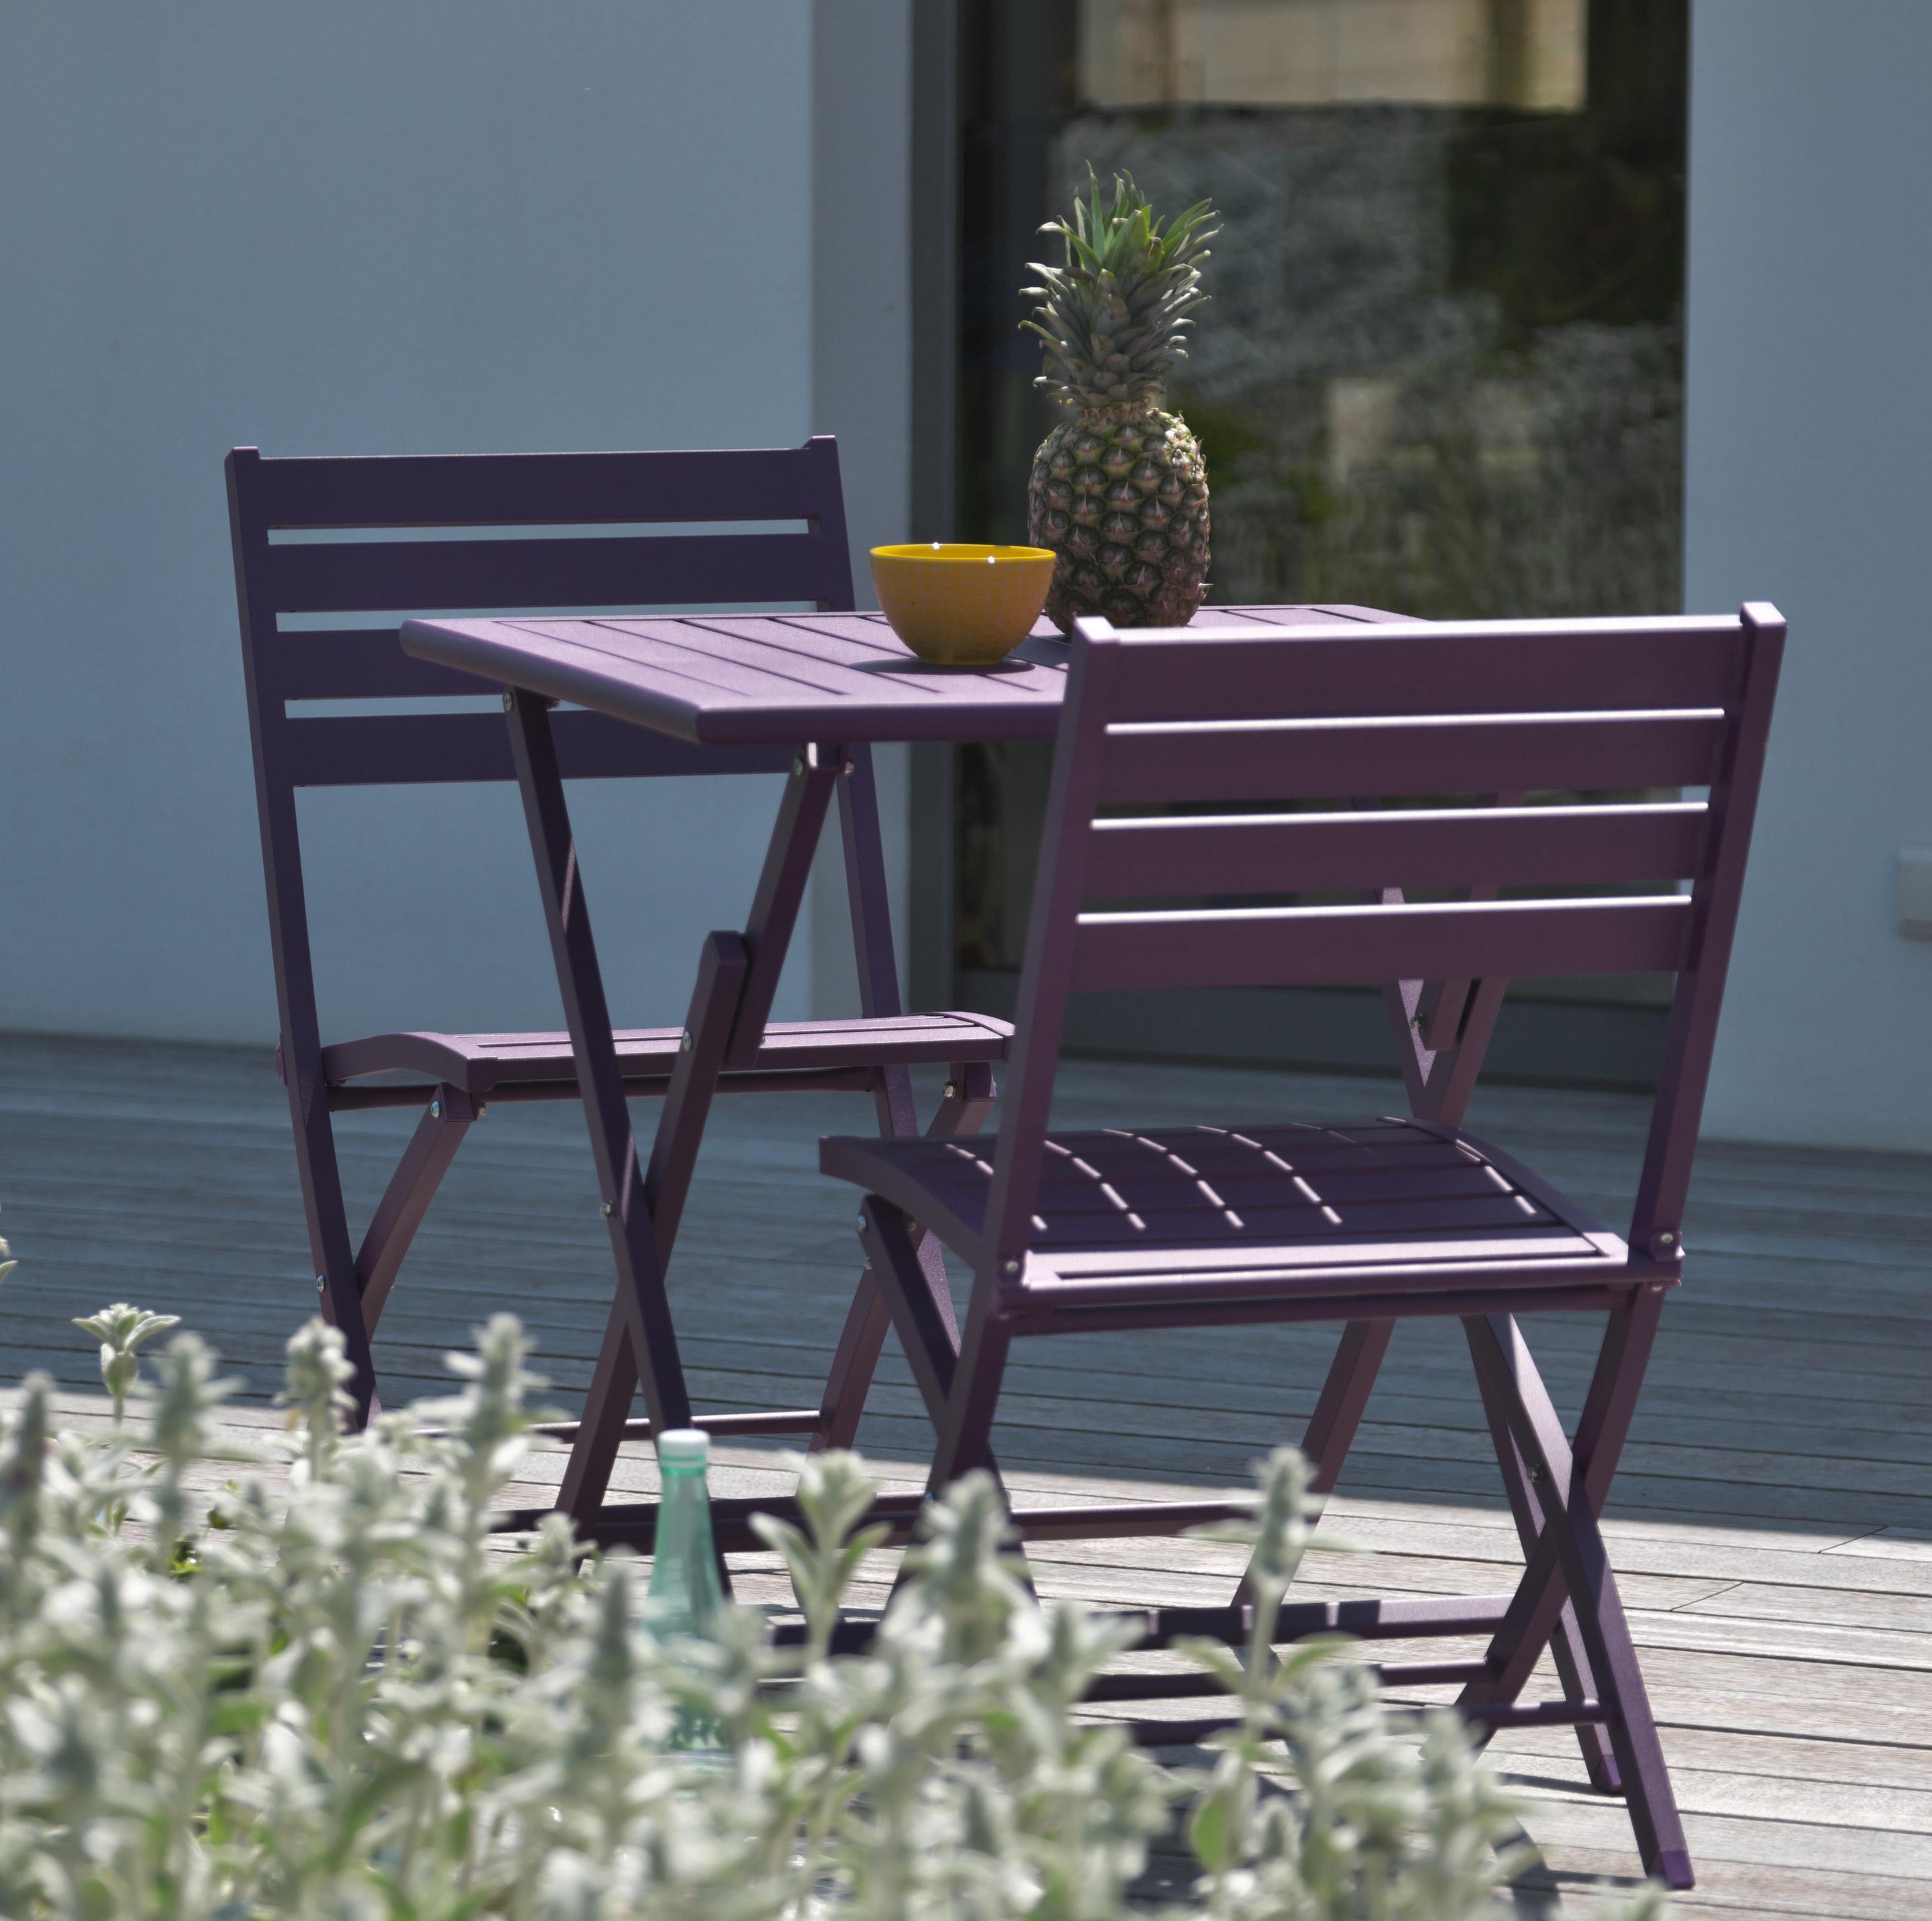 Table de jardin de repas Marius carrée aubergine 2 personnes